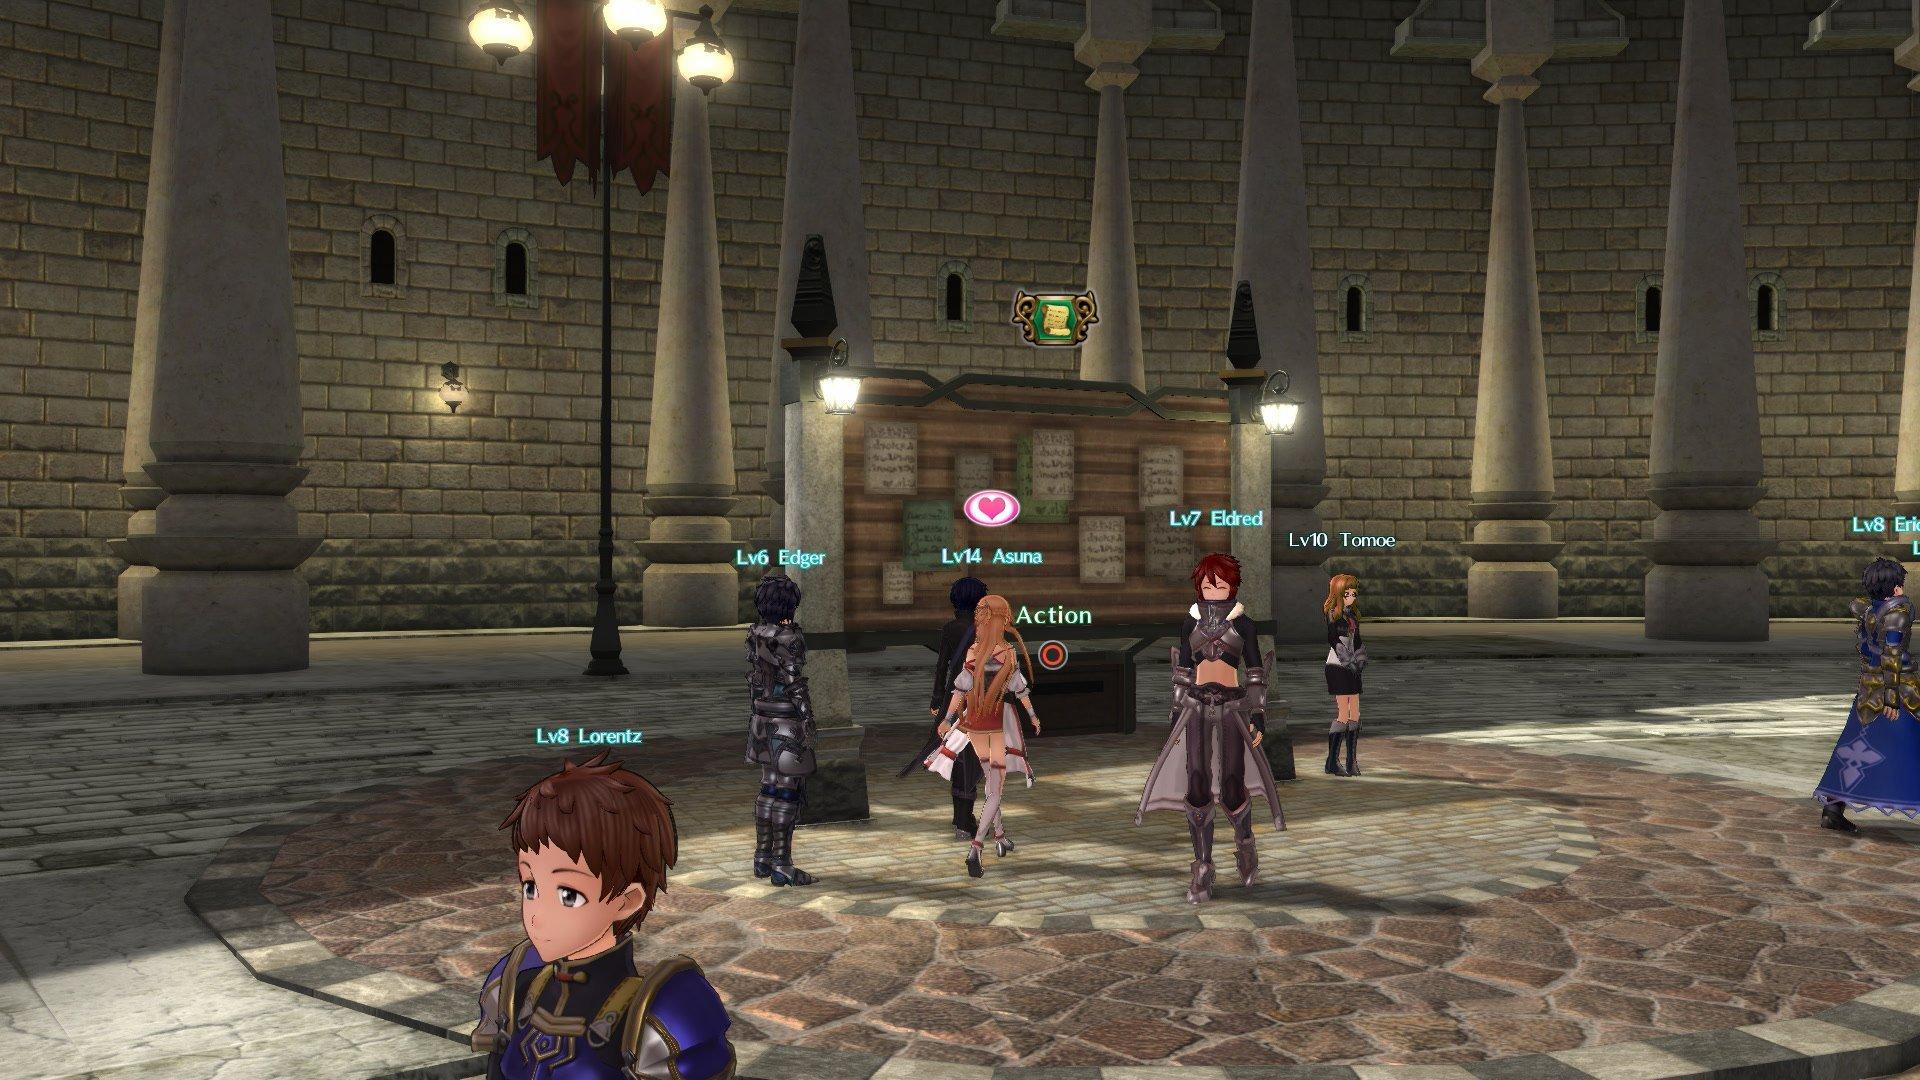 Análisis de Sword Art Online Hollow Realization para PS4